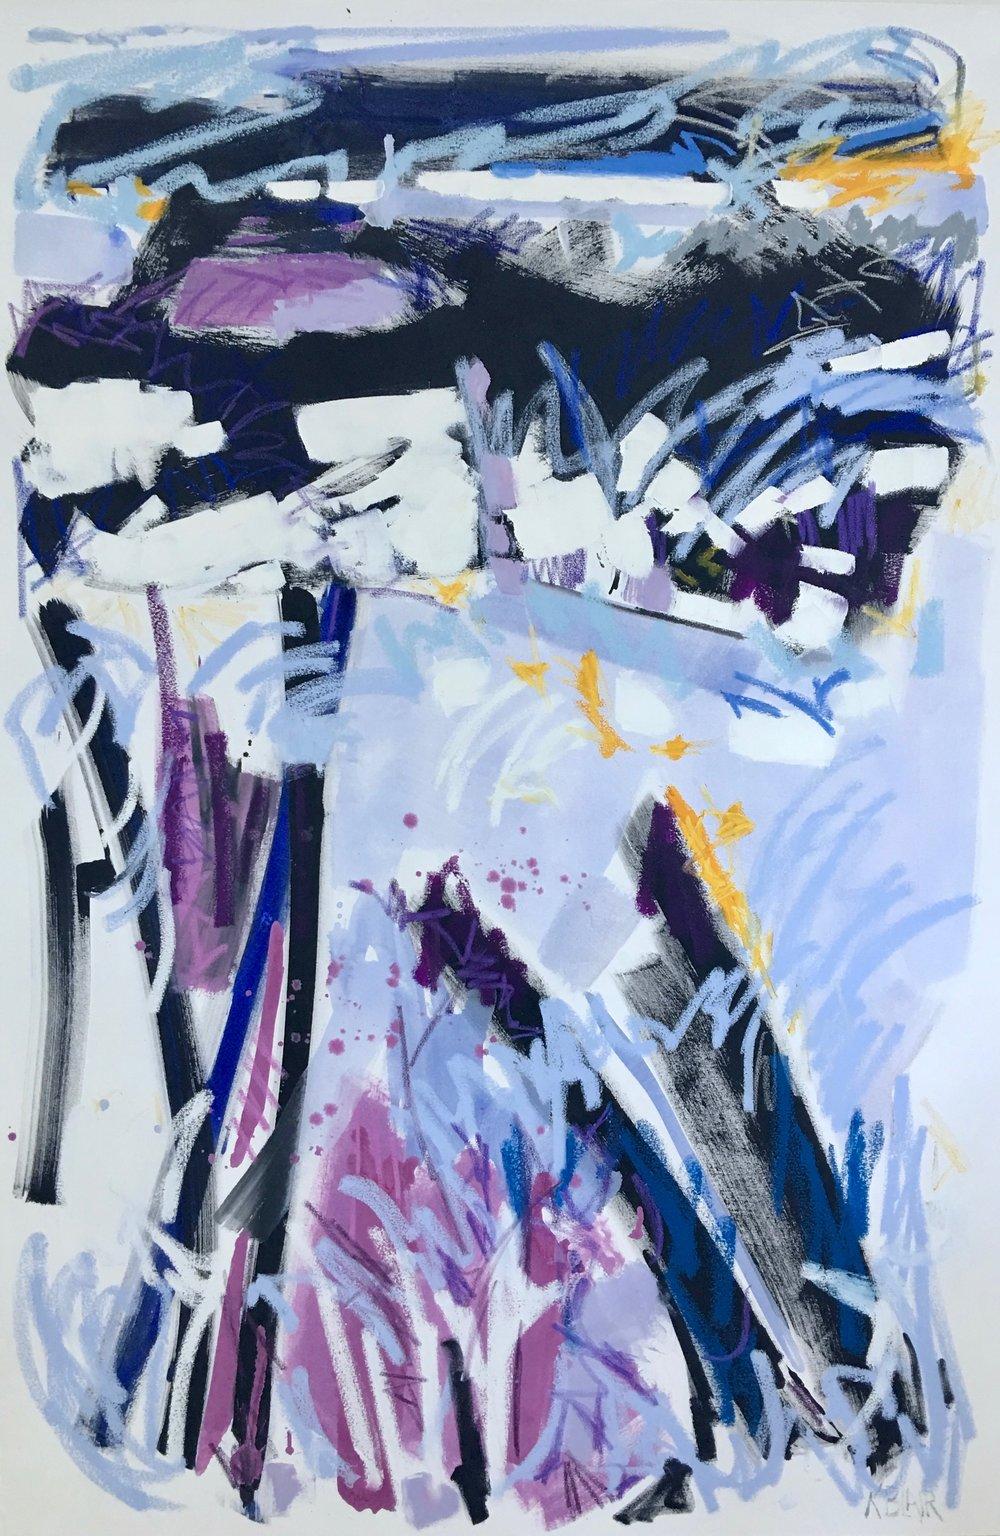 Lavender Fields I, 72x48